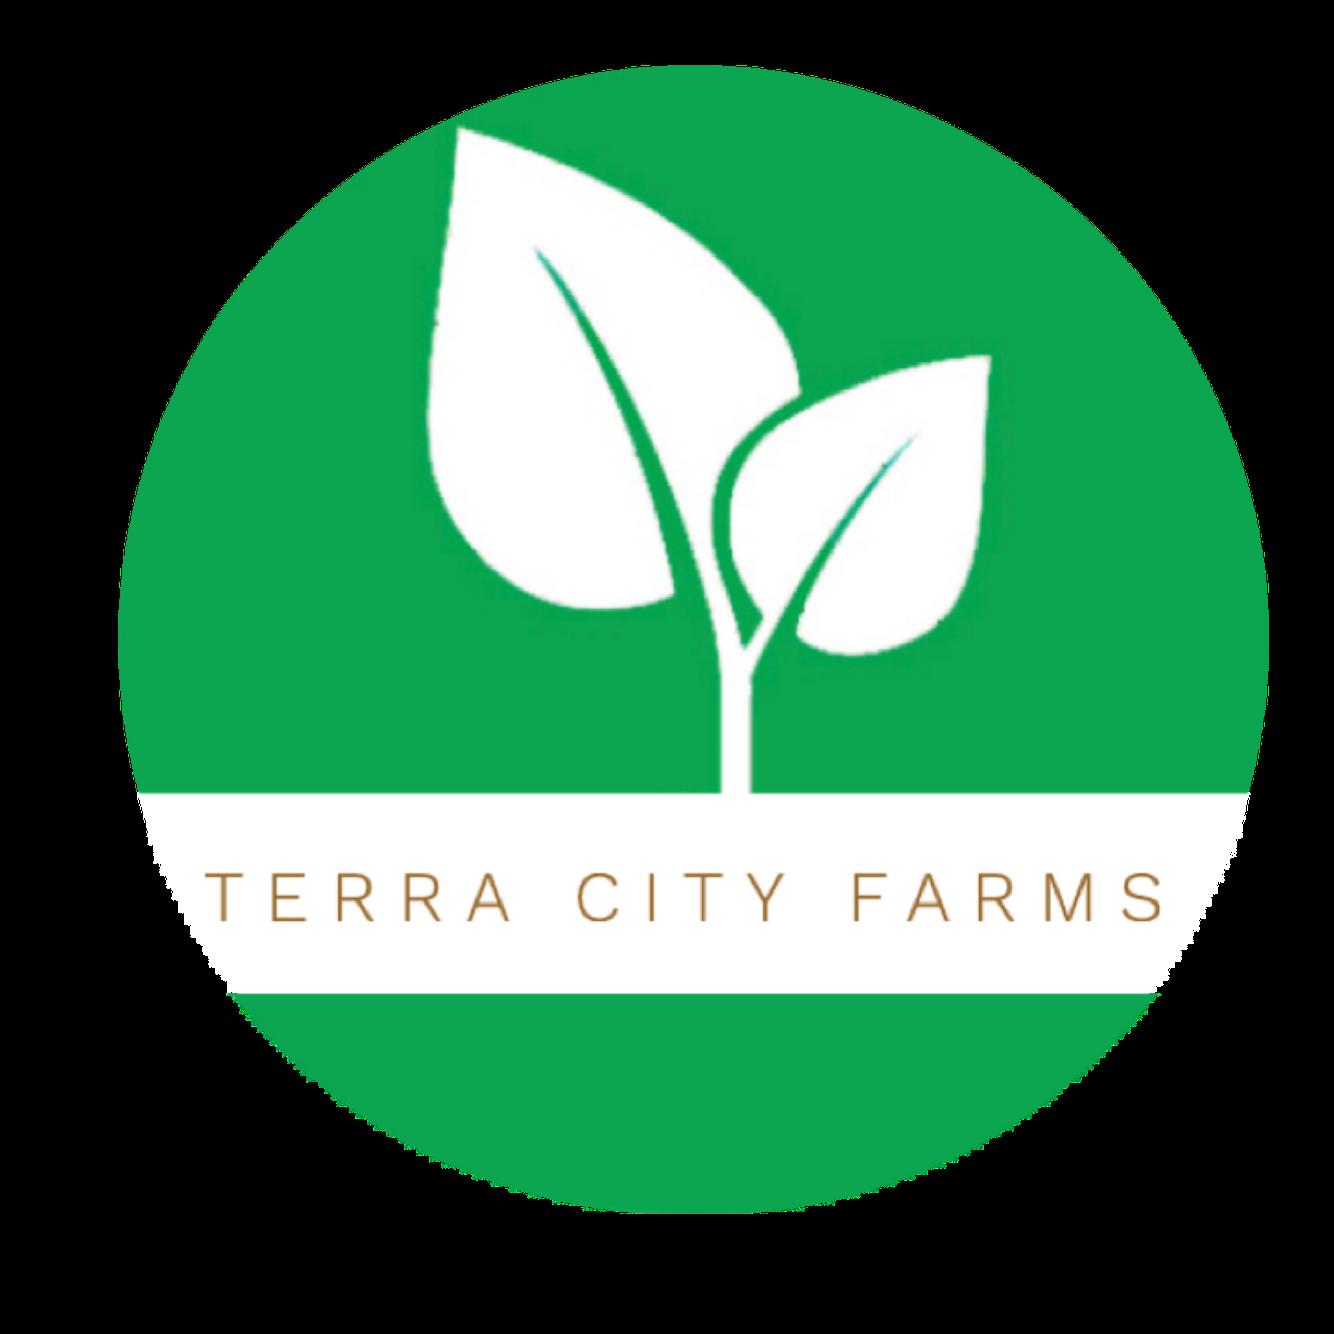 Terra City Farms